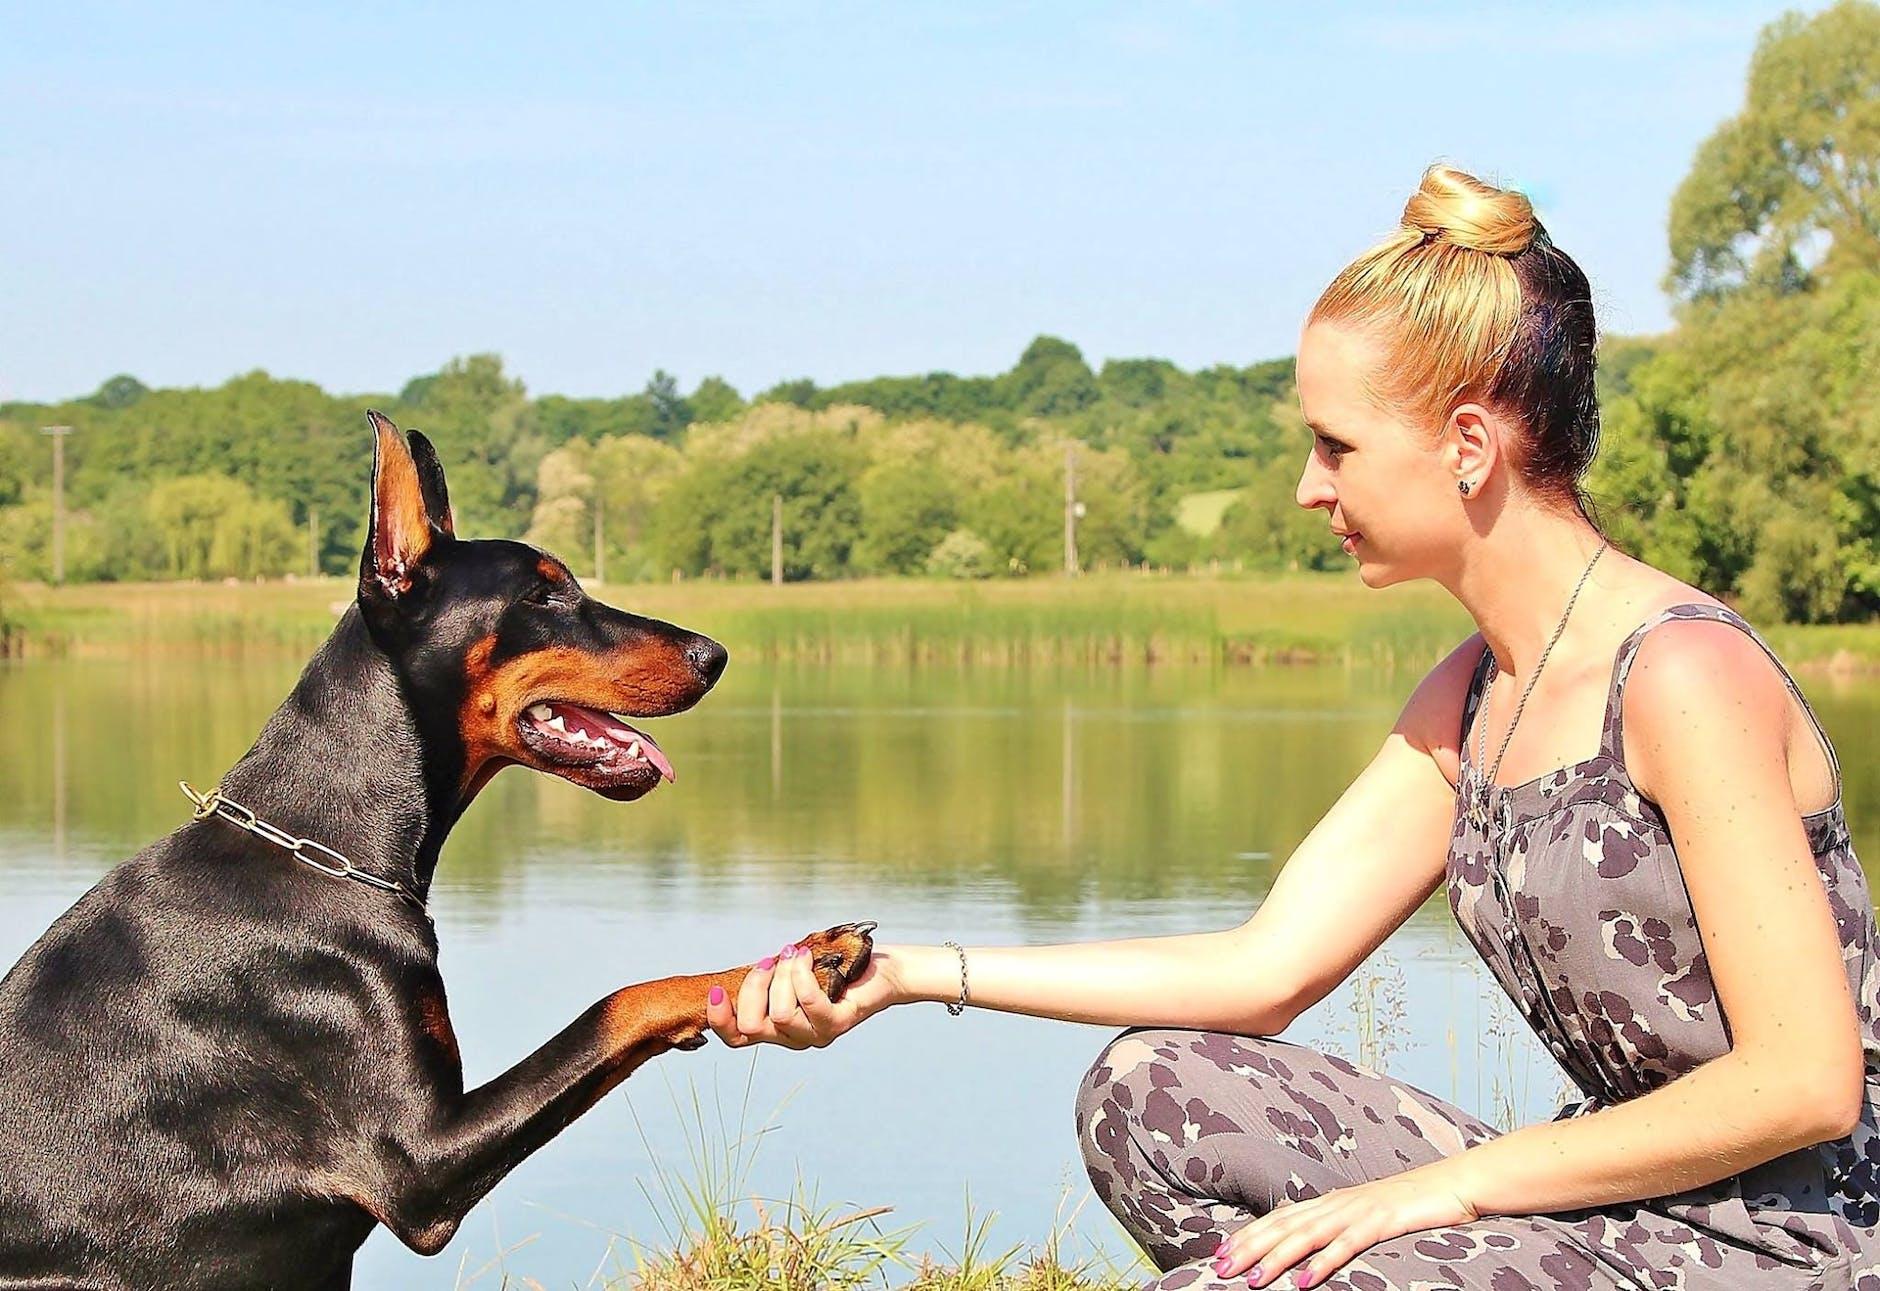 woman training a dog